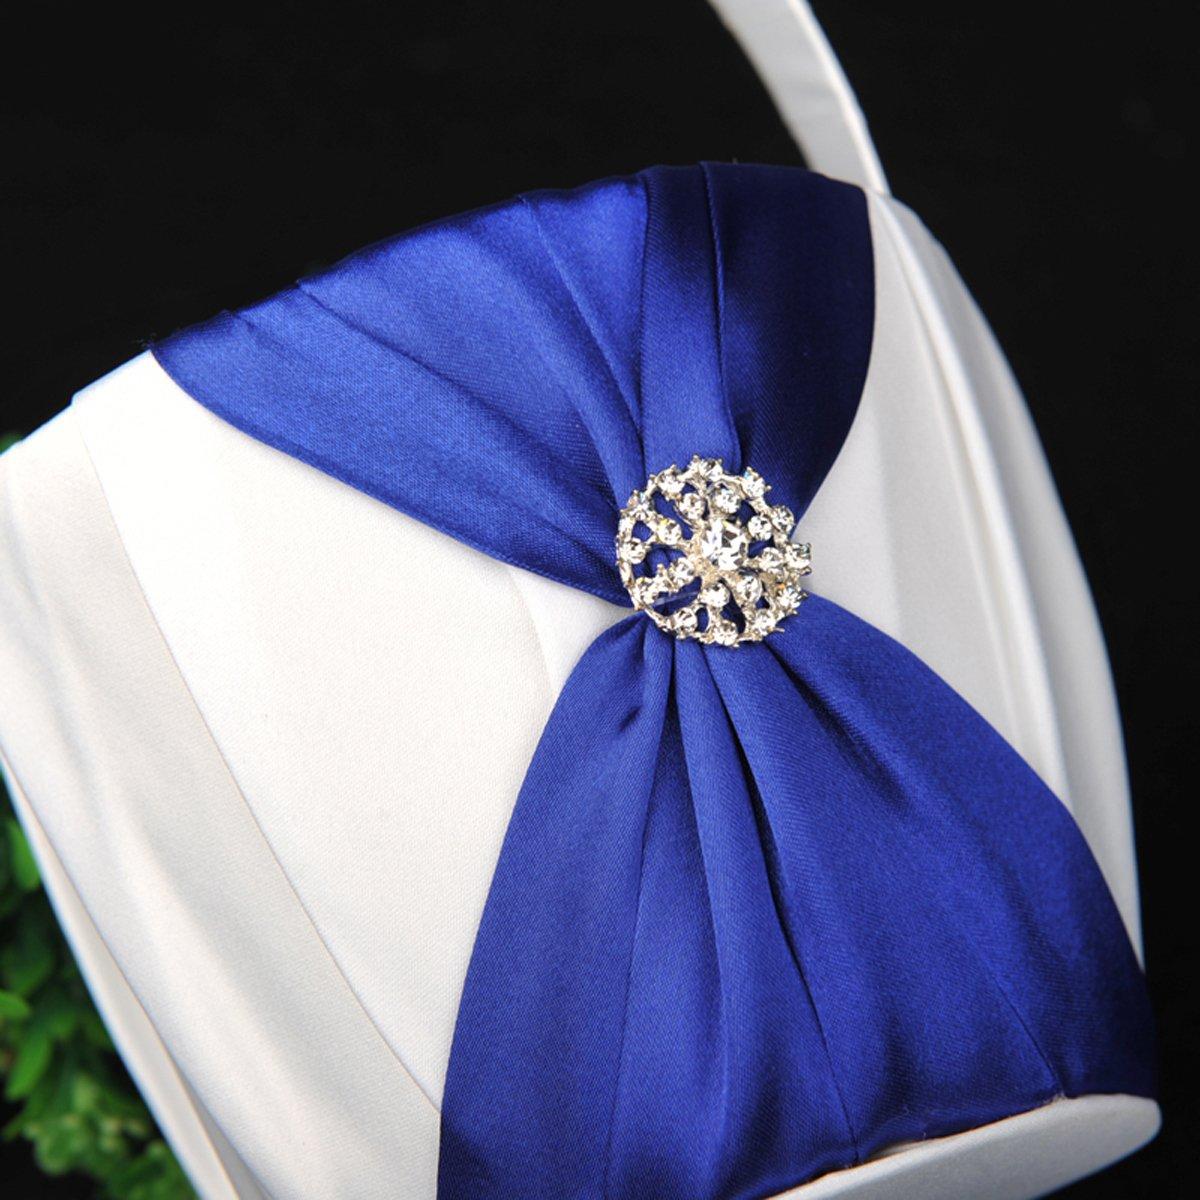 Famous Wedding Flower Girl Baskets Gift Blue Wedding Color Ideas